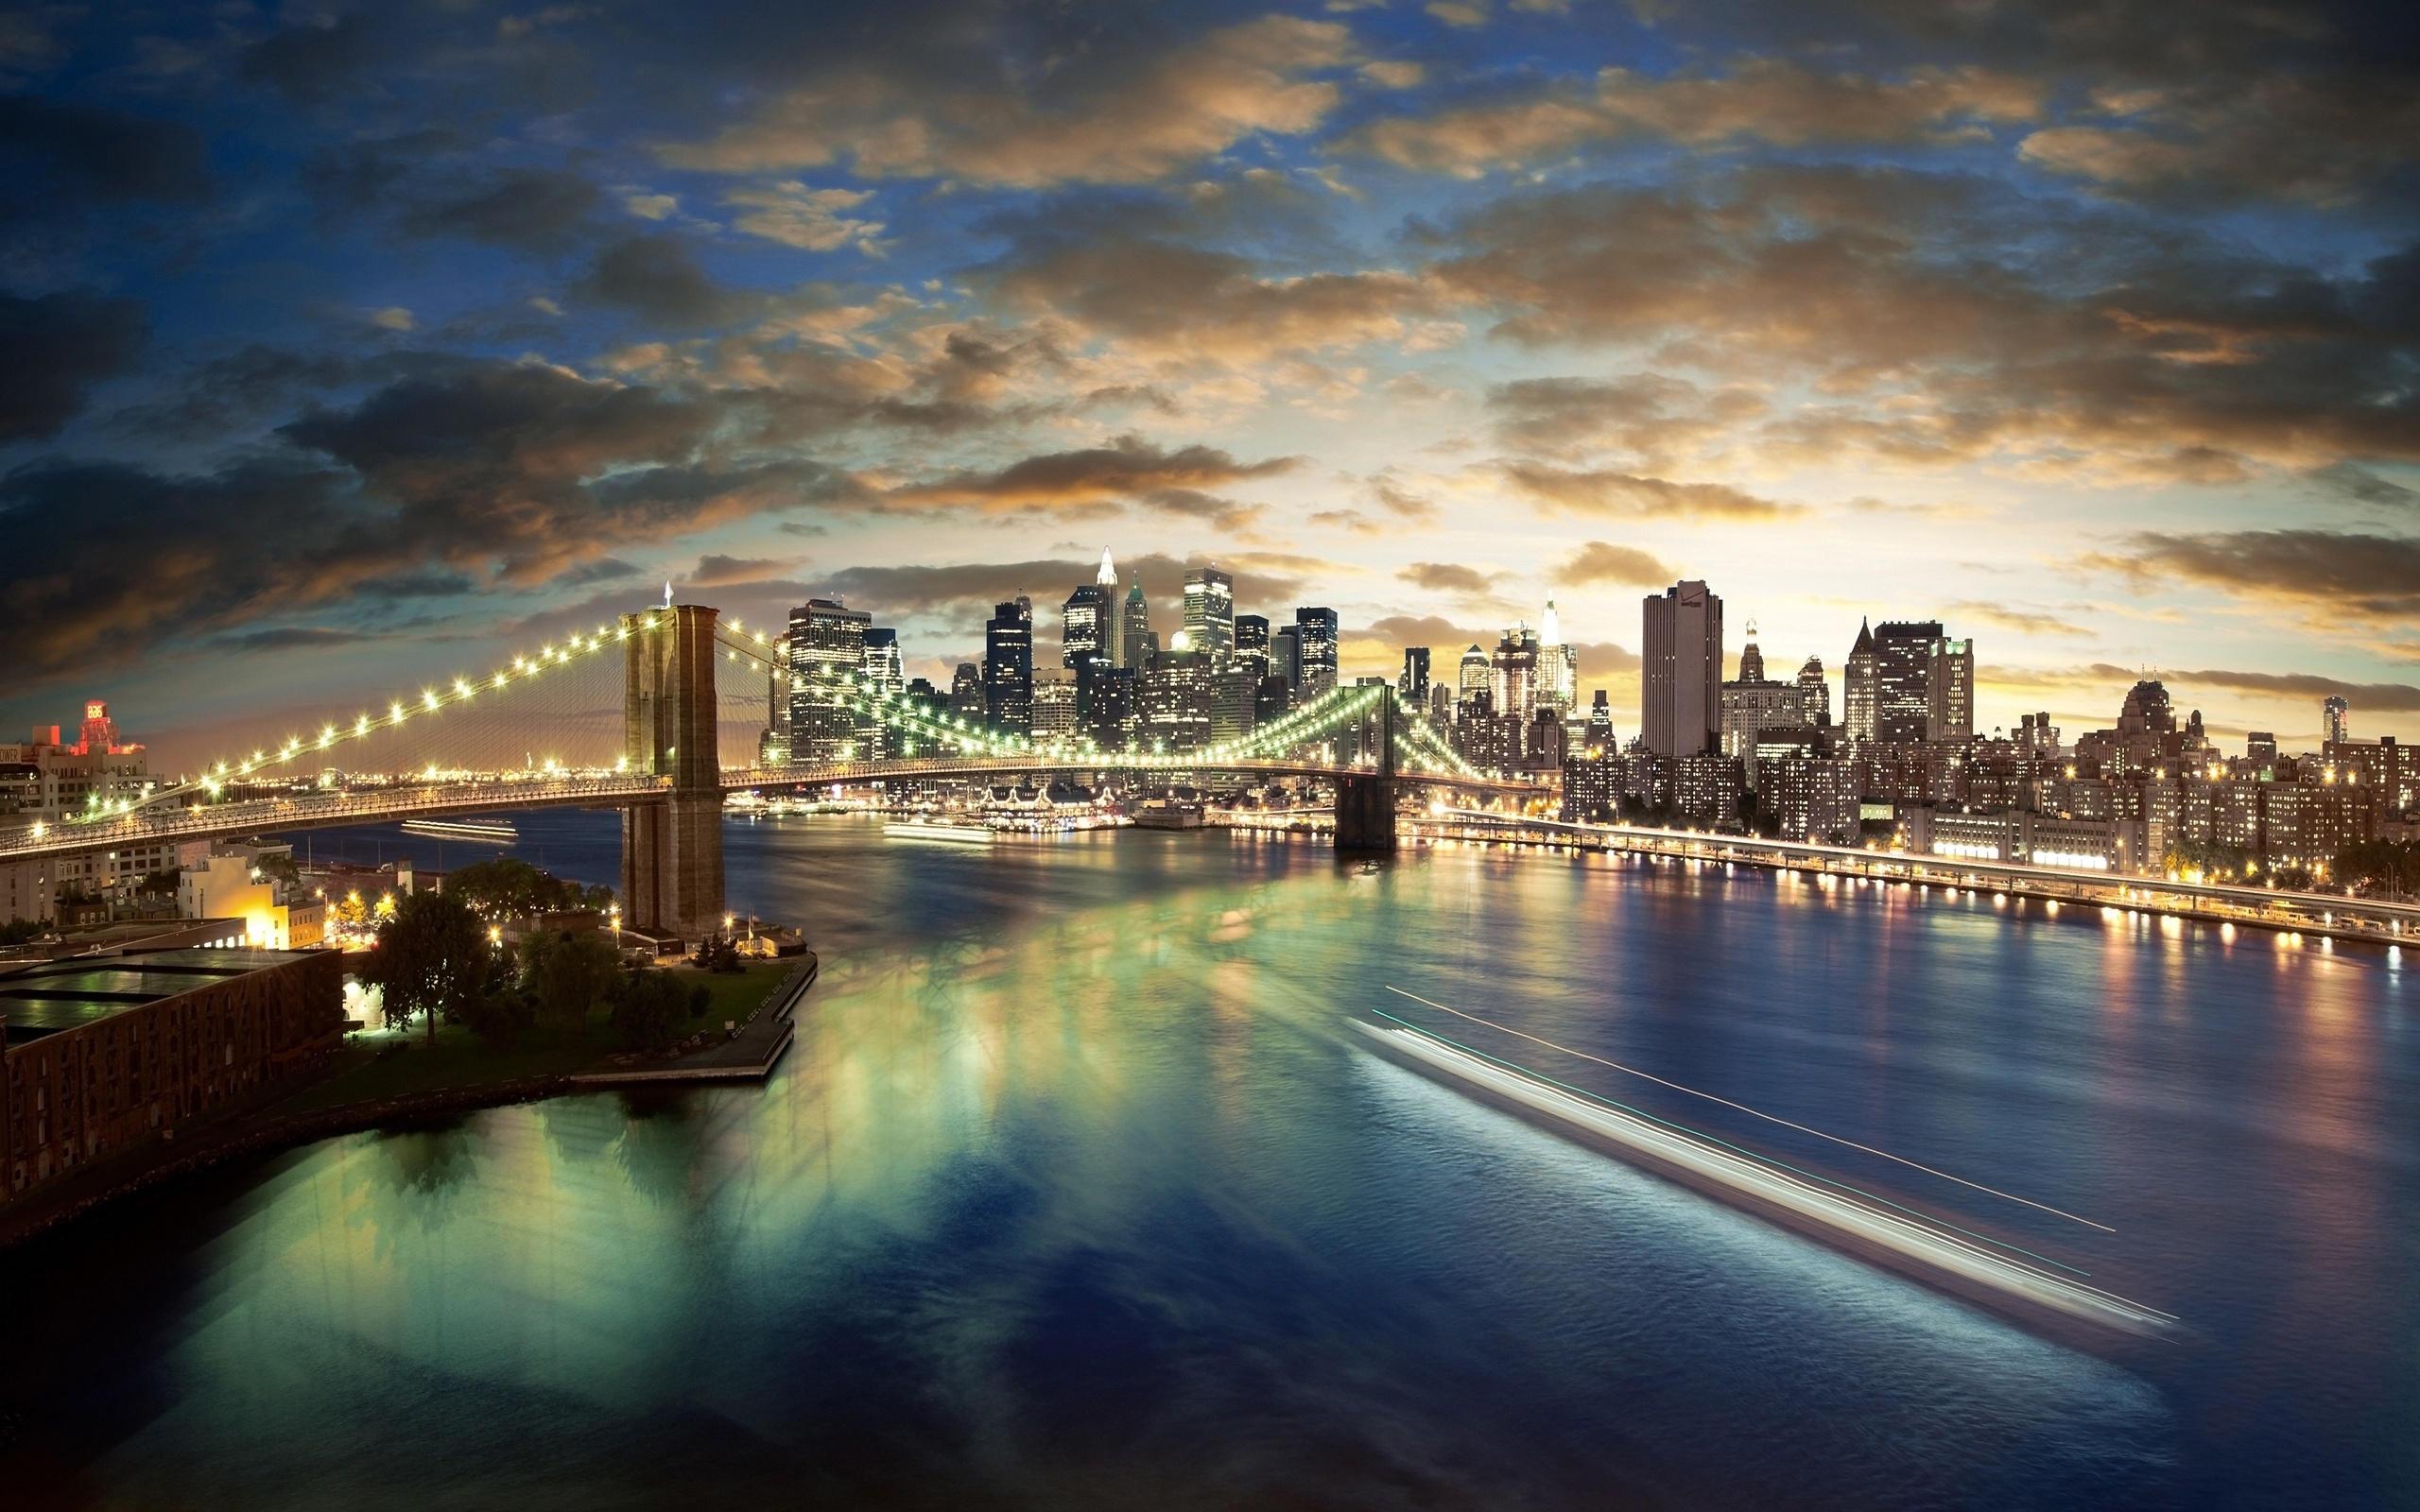 46 Windows 10 City Wallpaper On Wallpapersafari